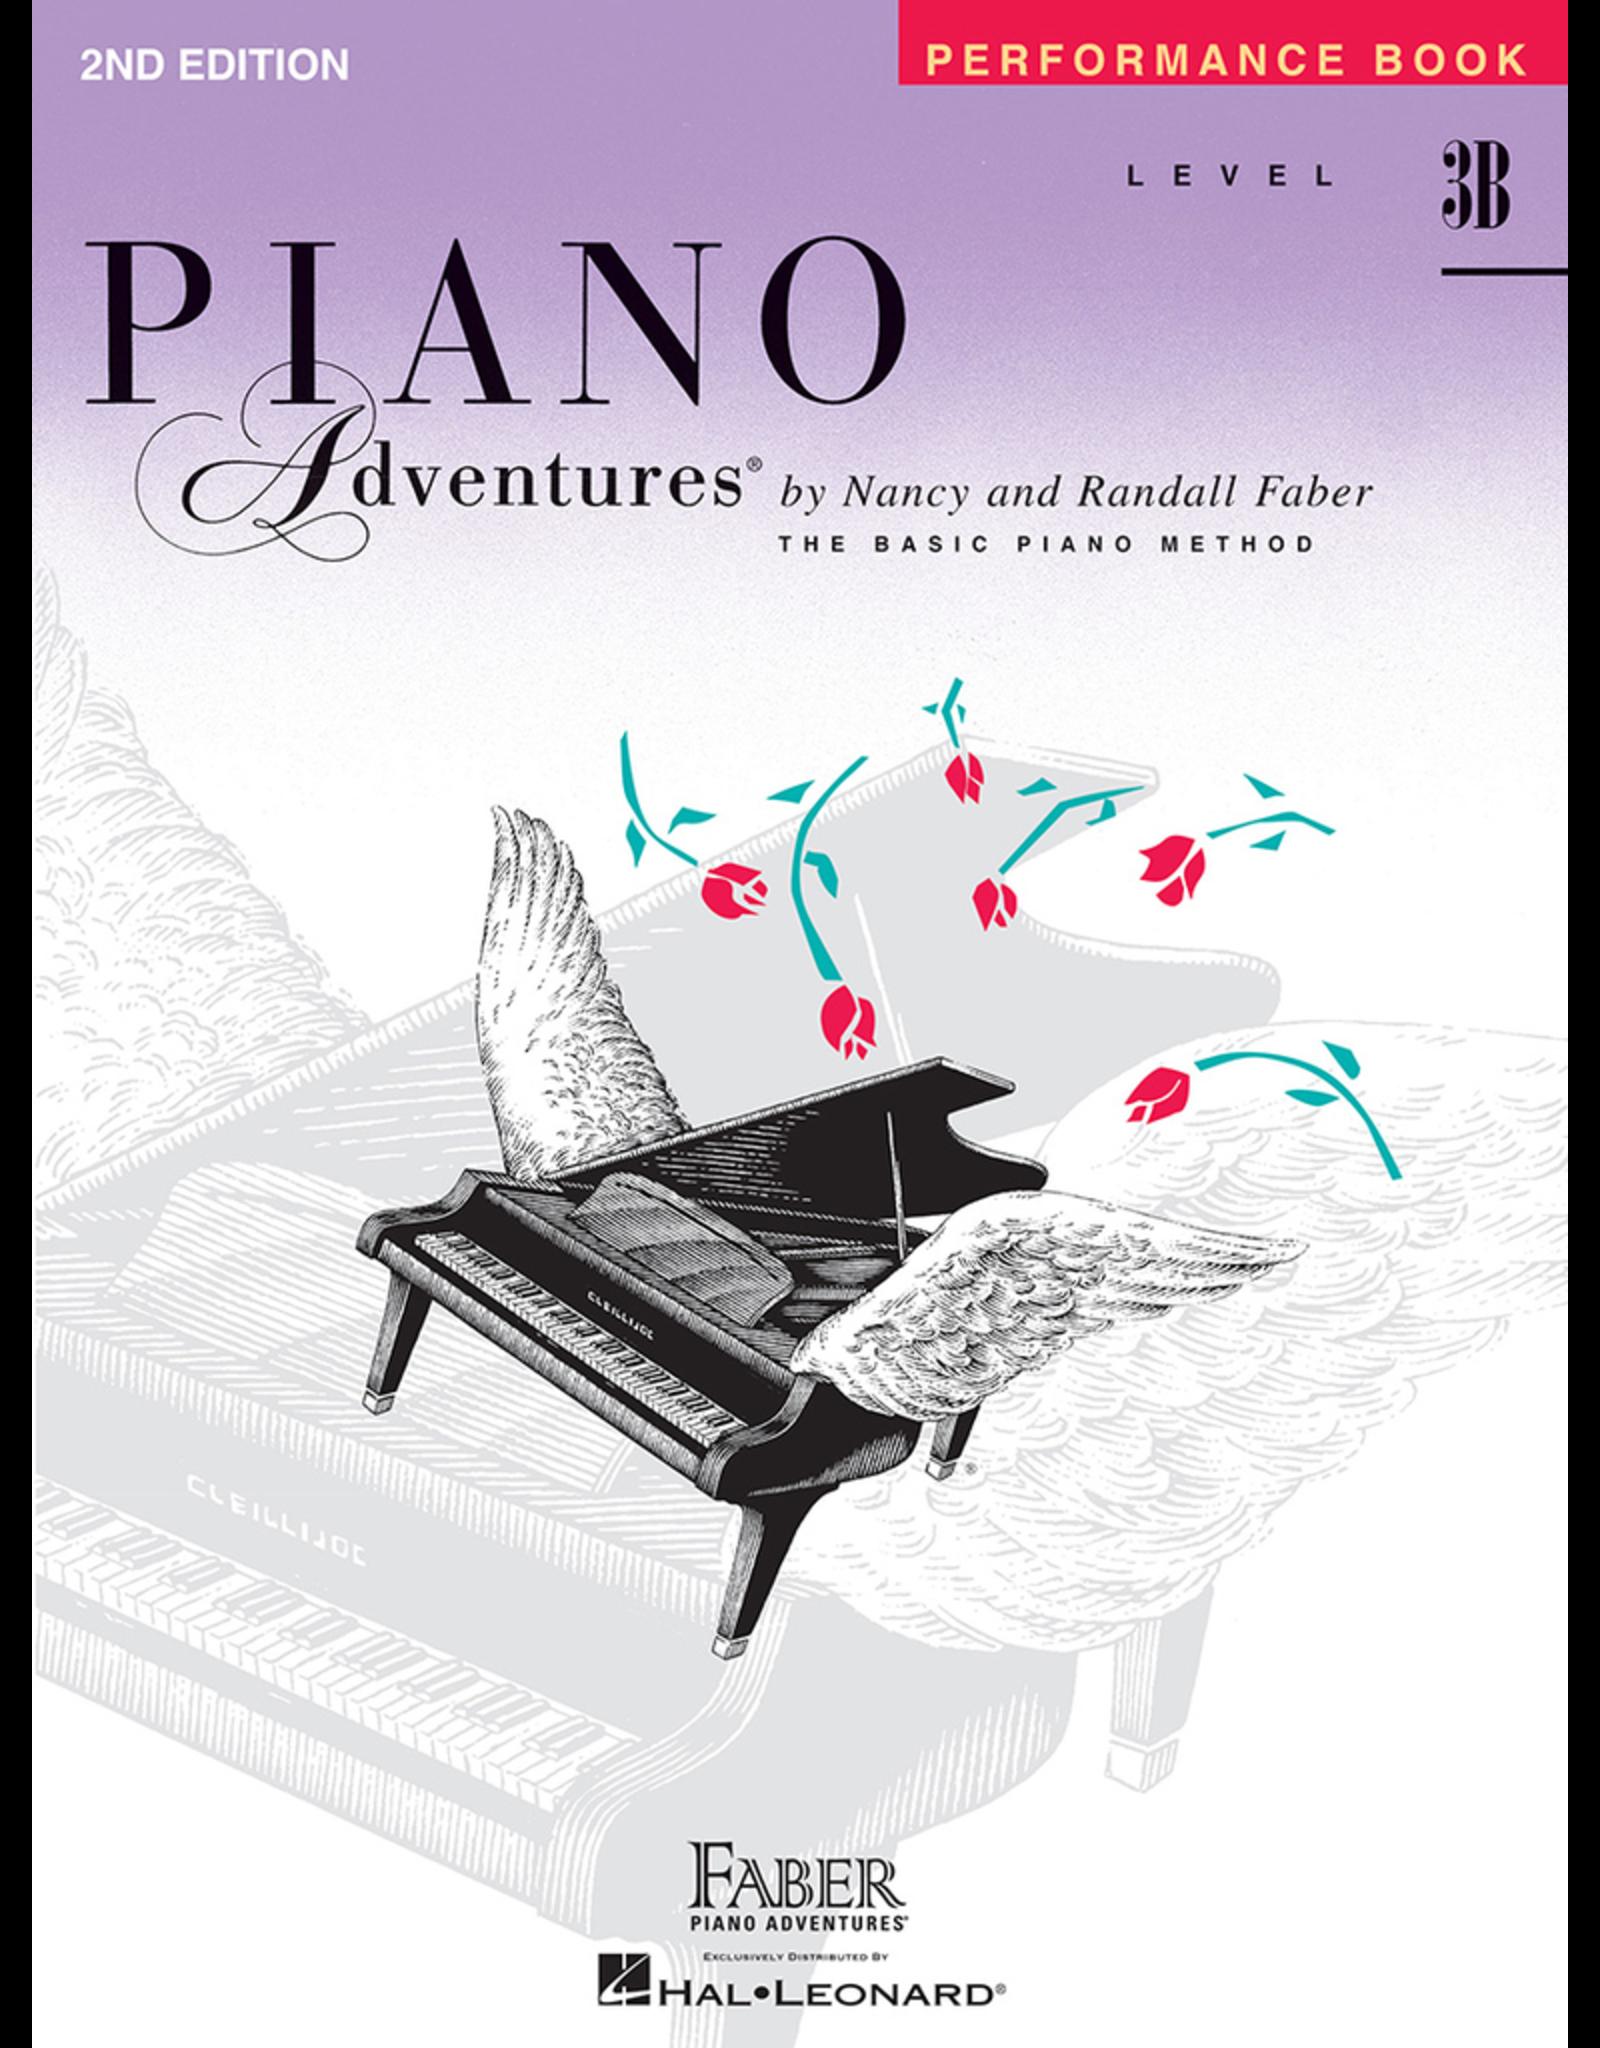 Hal Leonard Piano Adventures Performance Book, Level 3B